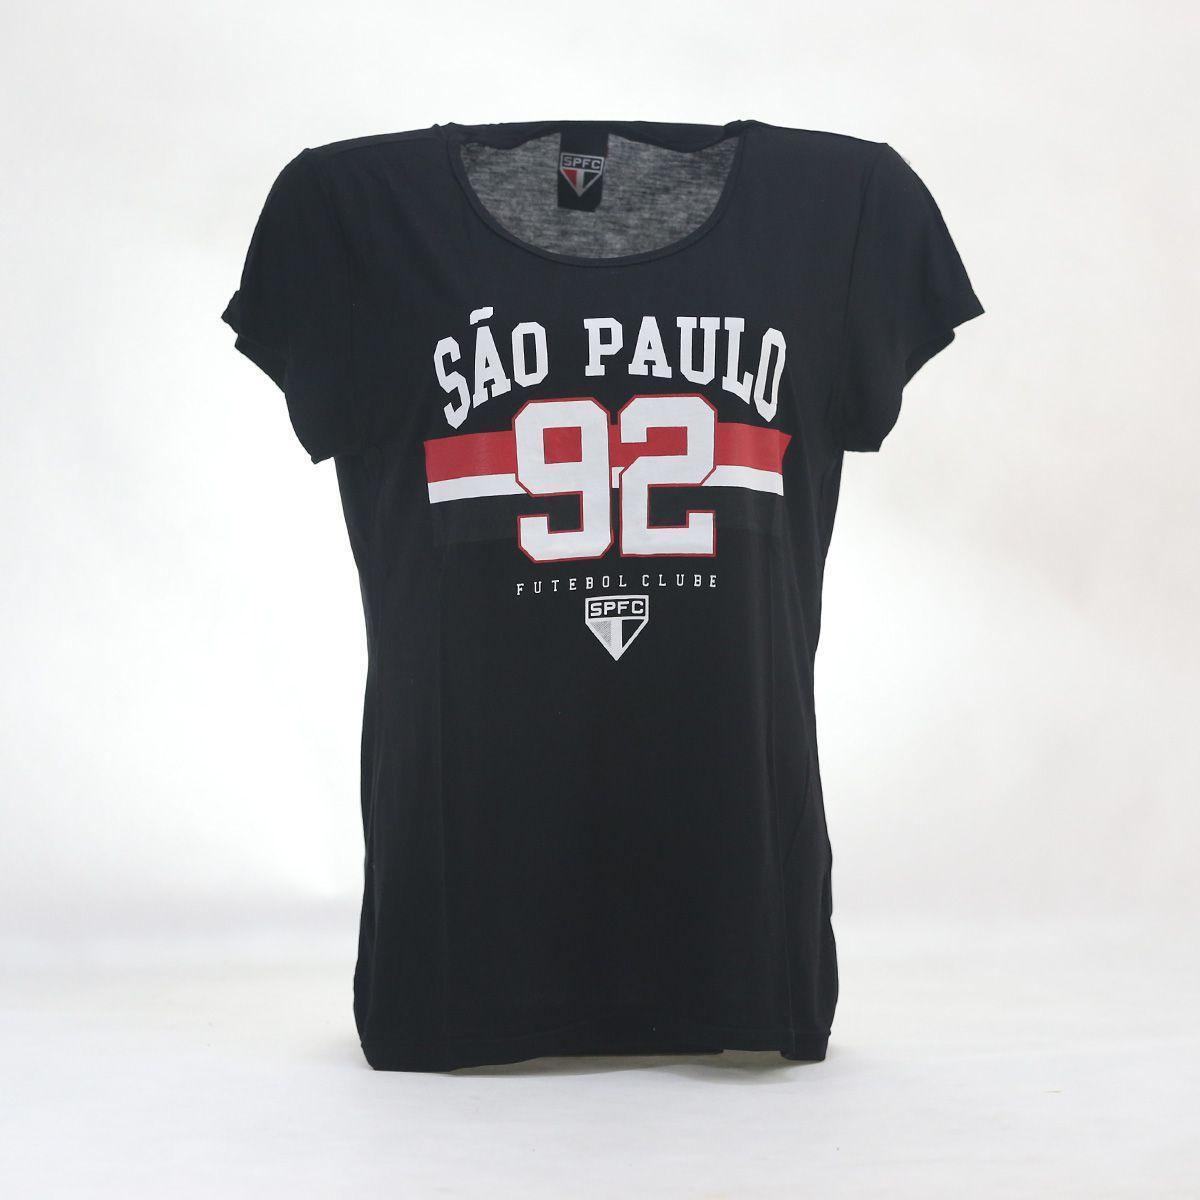 CAMISETA FEMININA SÃO PAULO 92 PRETA